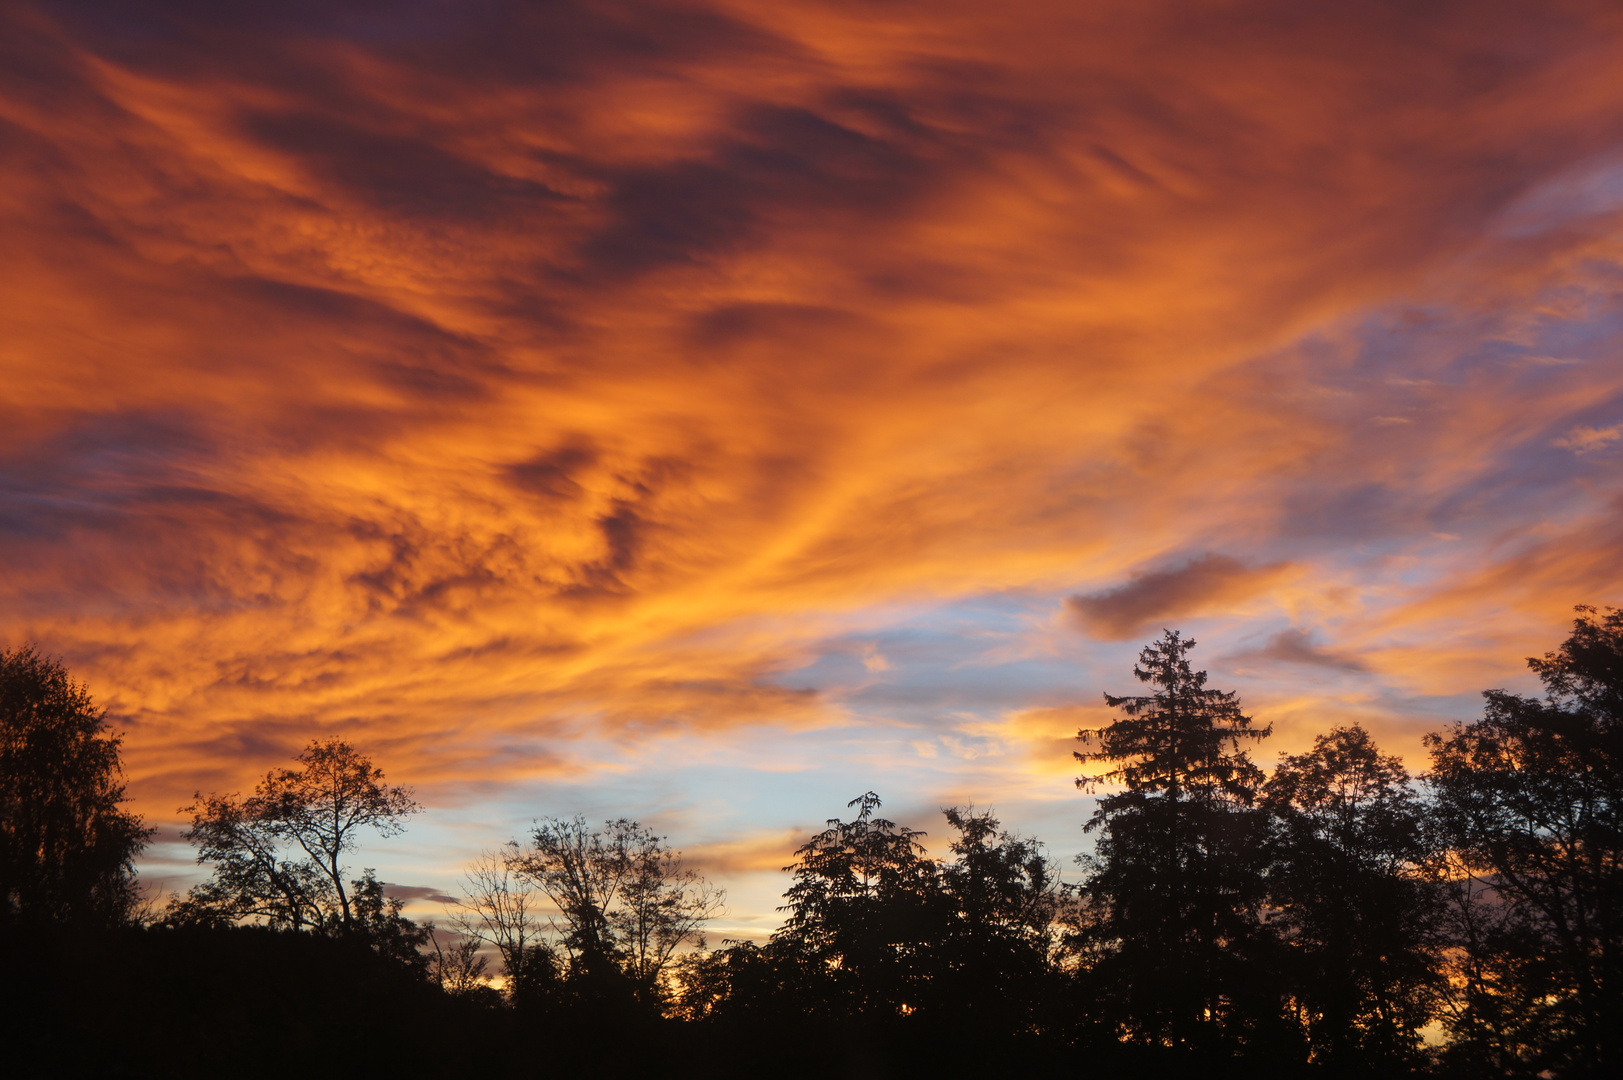 Sonnenaufgang hinterm Haus